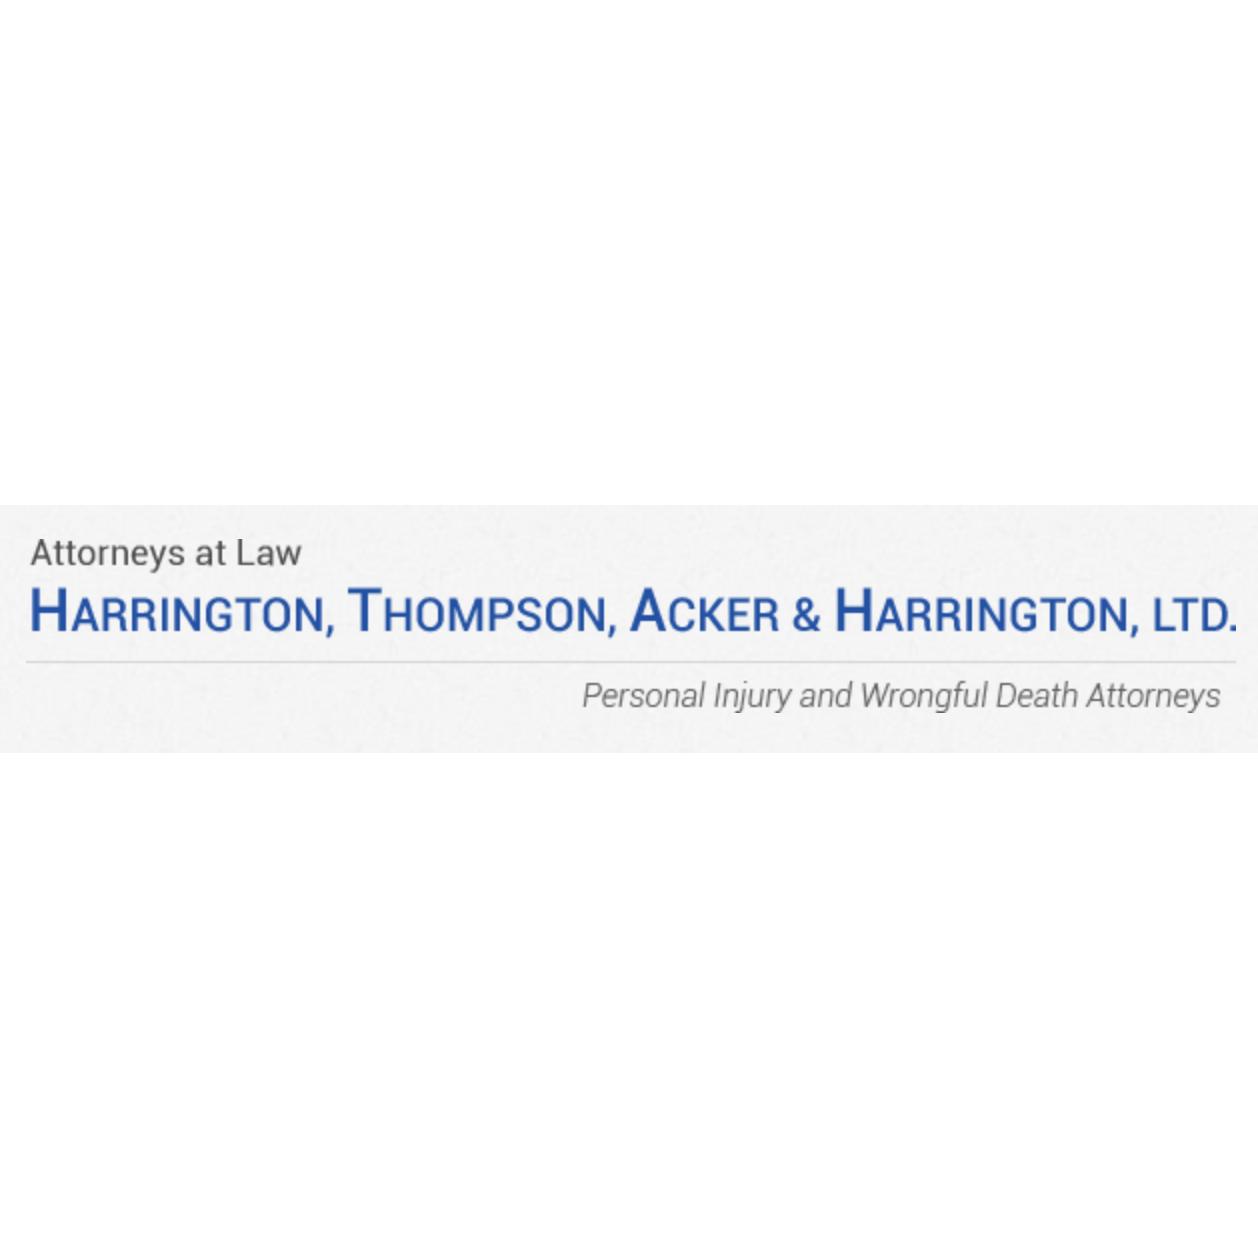 Harrington, Thompson, Acker & Harrington, Ltd.